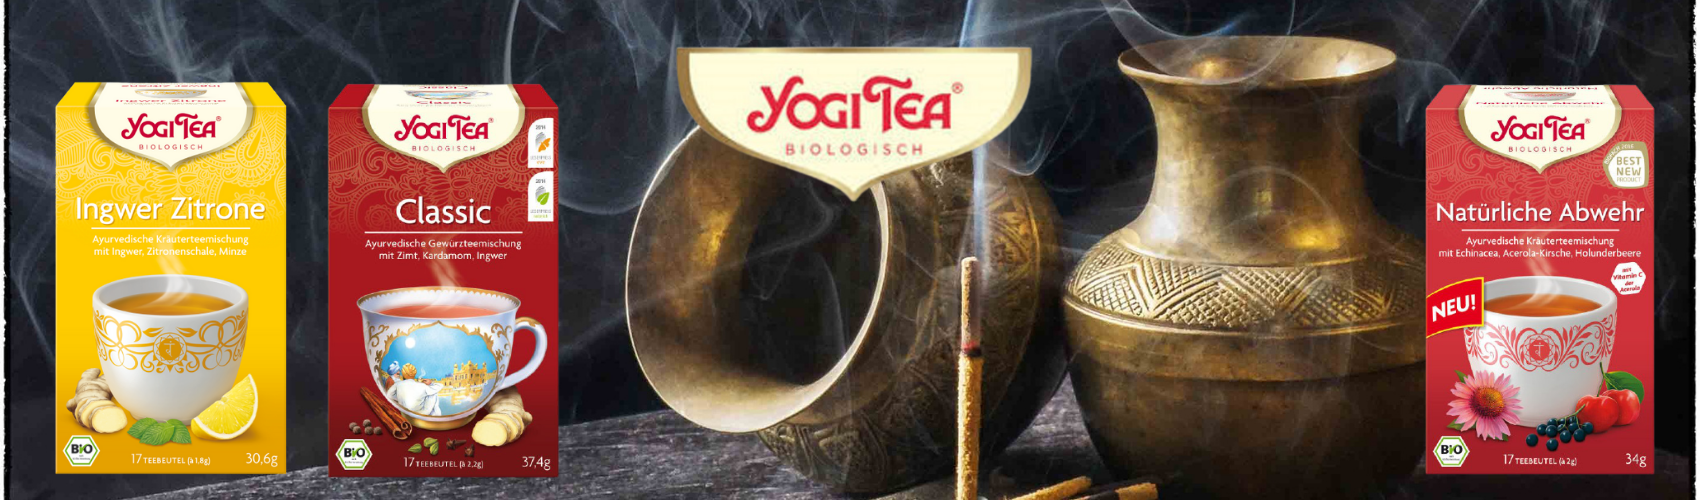 Yogi Tea Winter 2020